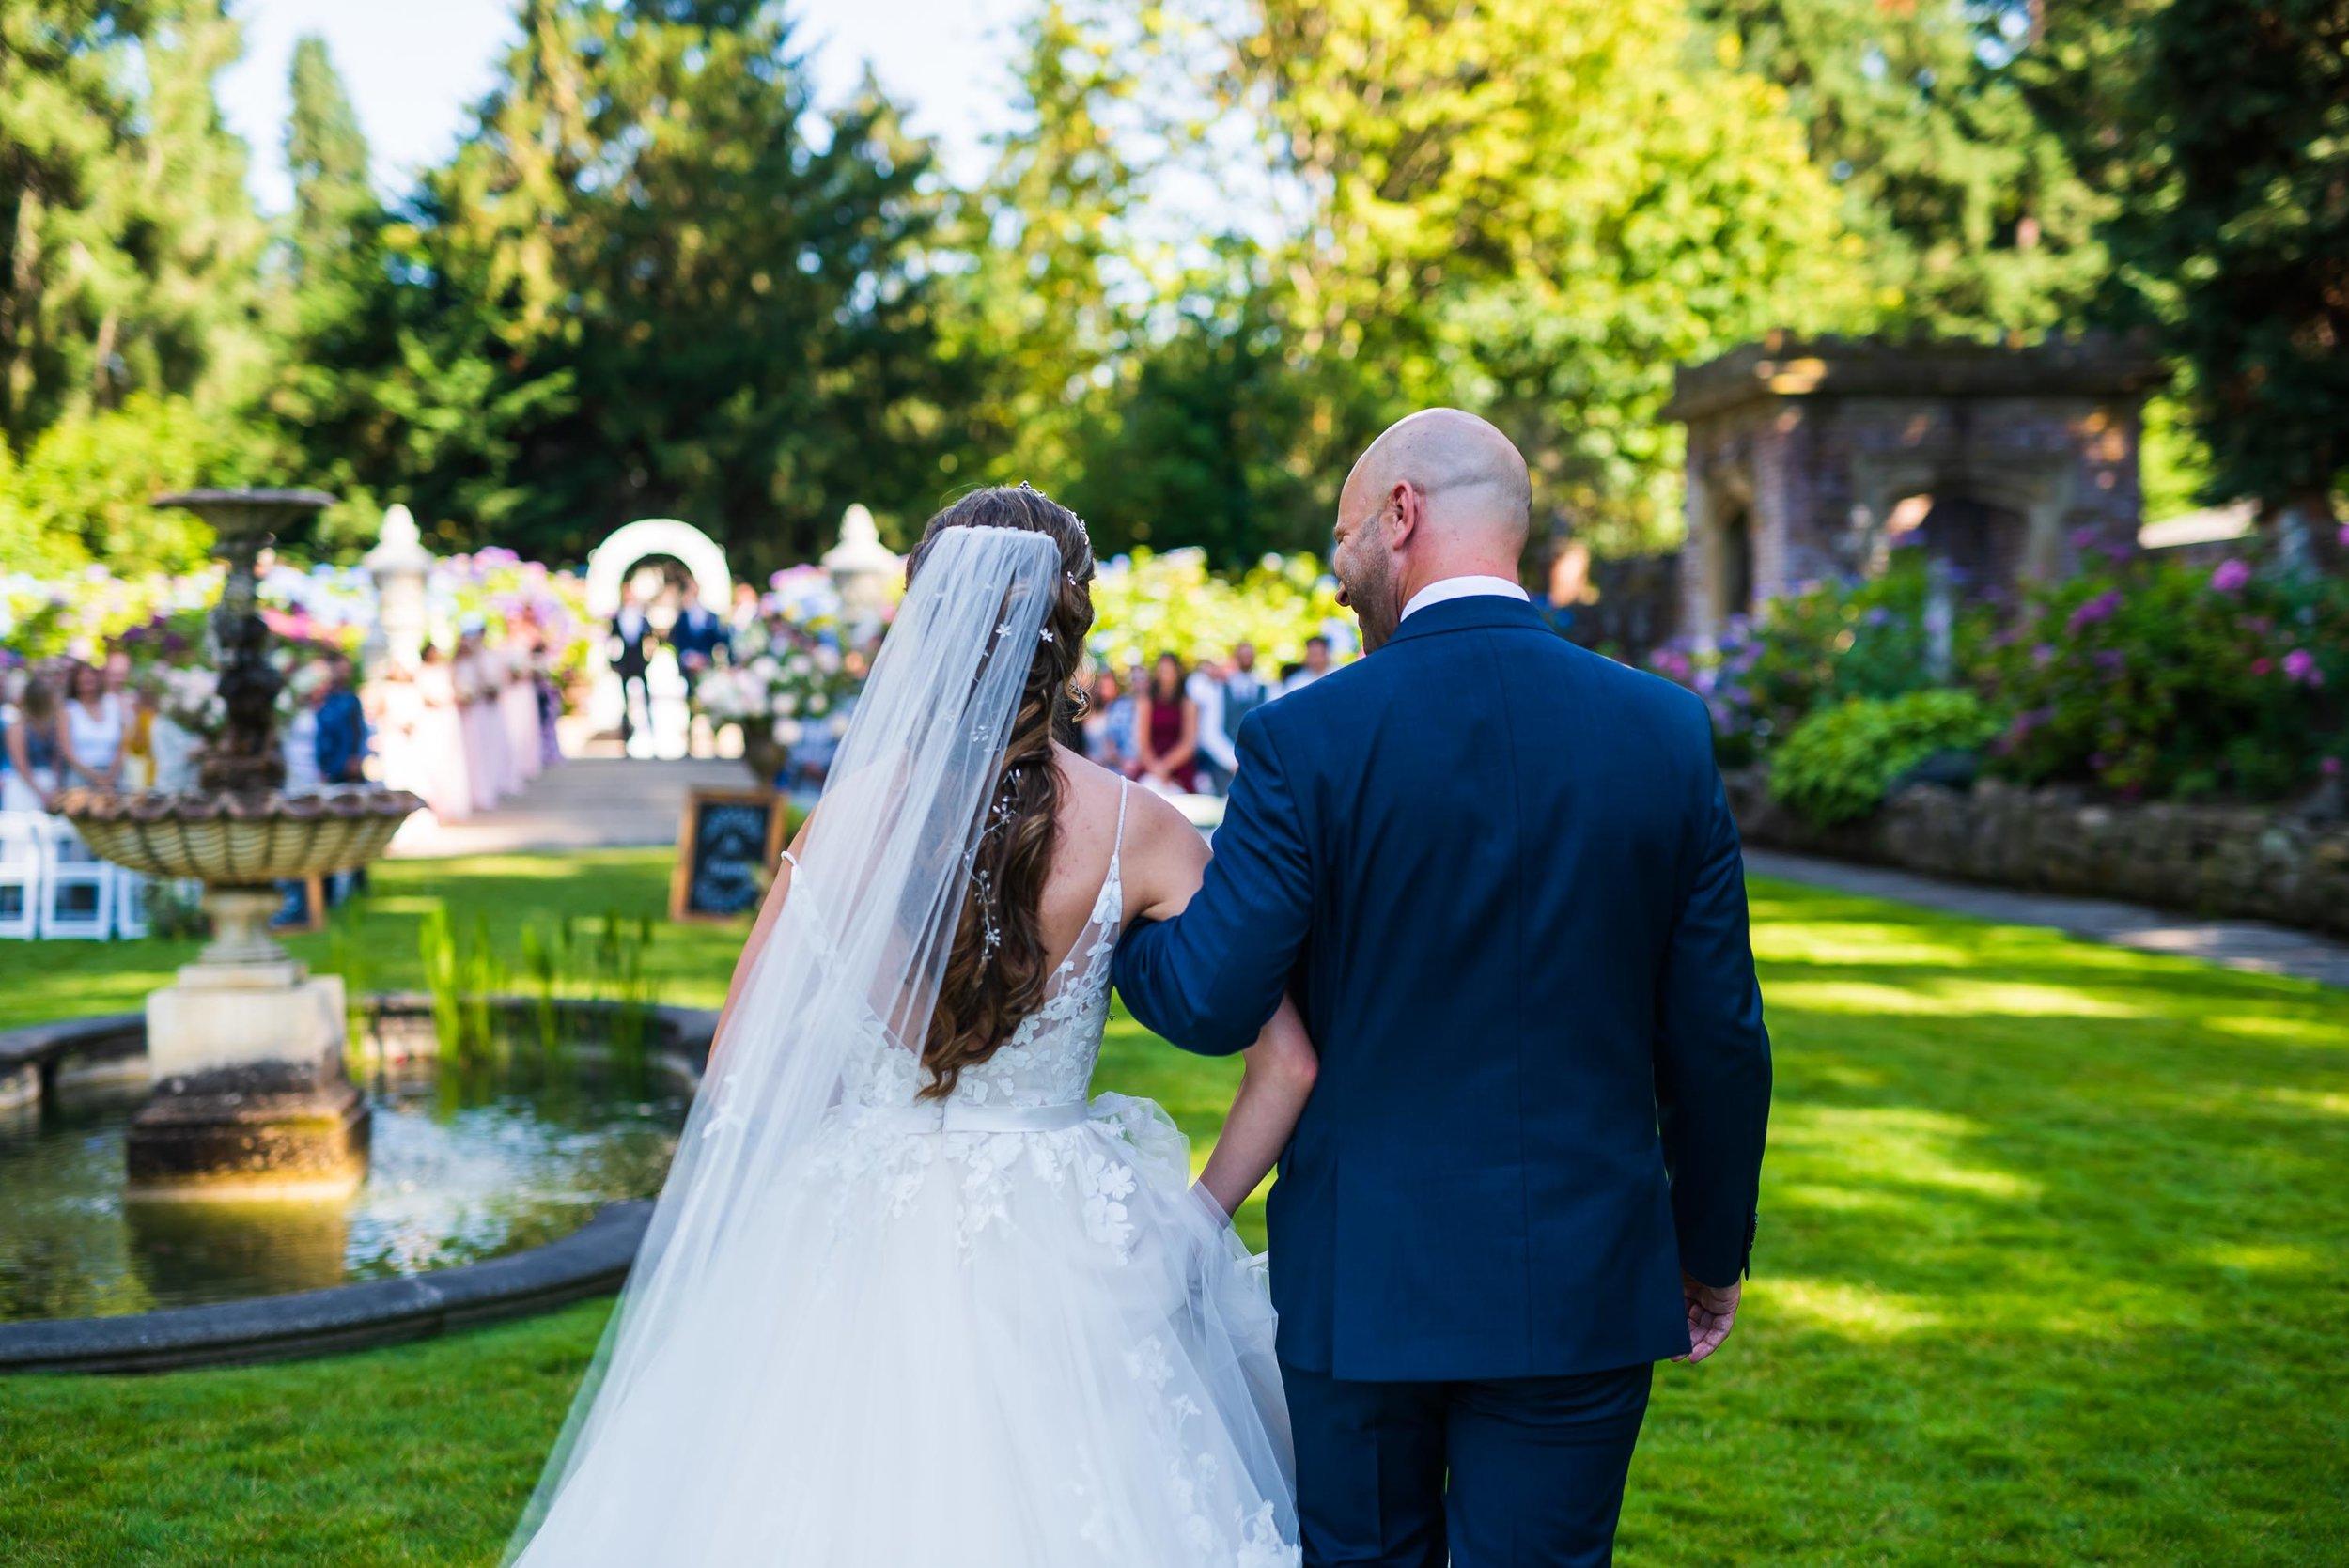 thornewood castle wedding 46.jpg